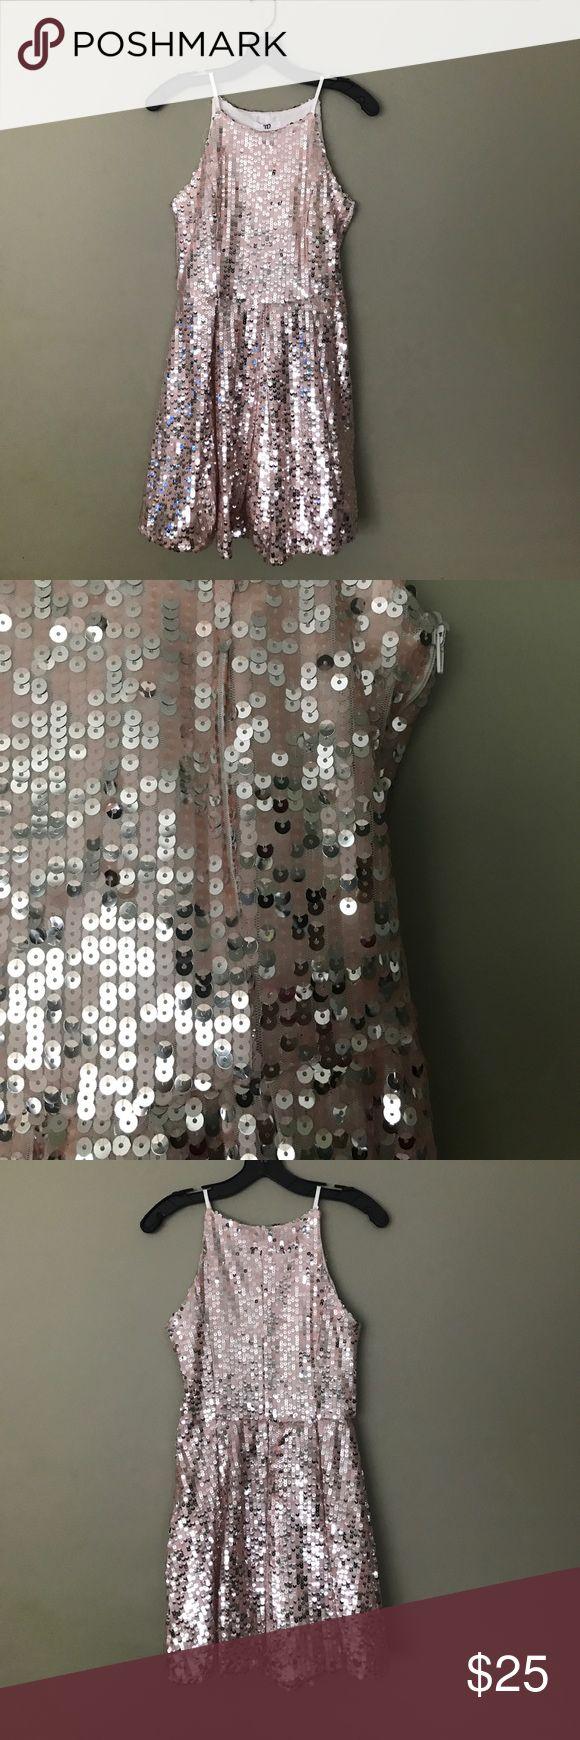 True Decadence Pink sparkly petite dress True Decadence Pink sparkly petite dress True Decadence Dresses Mini